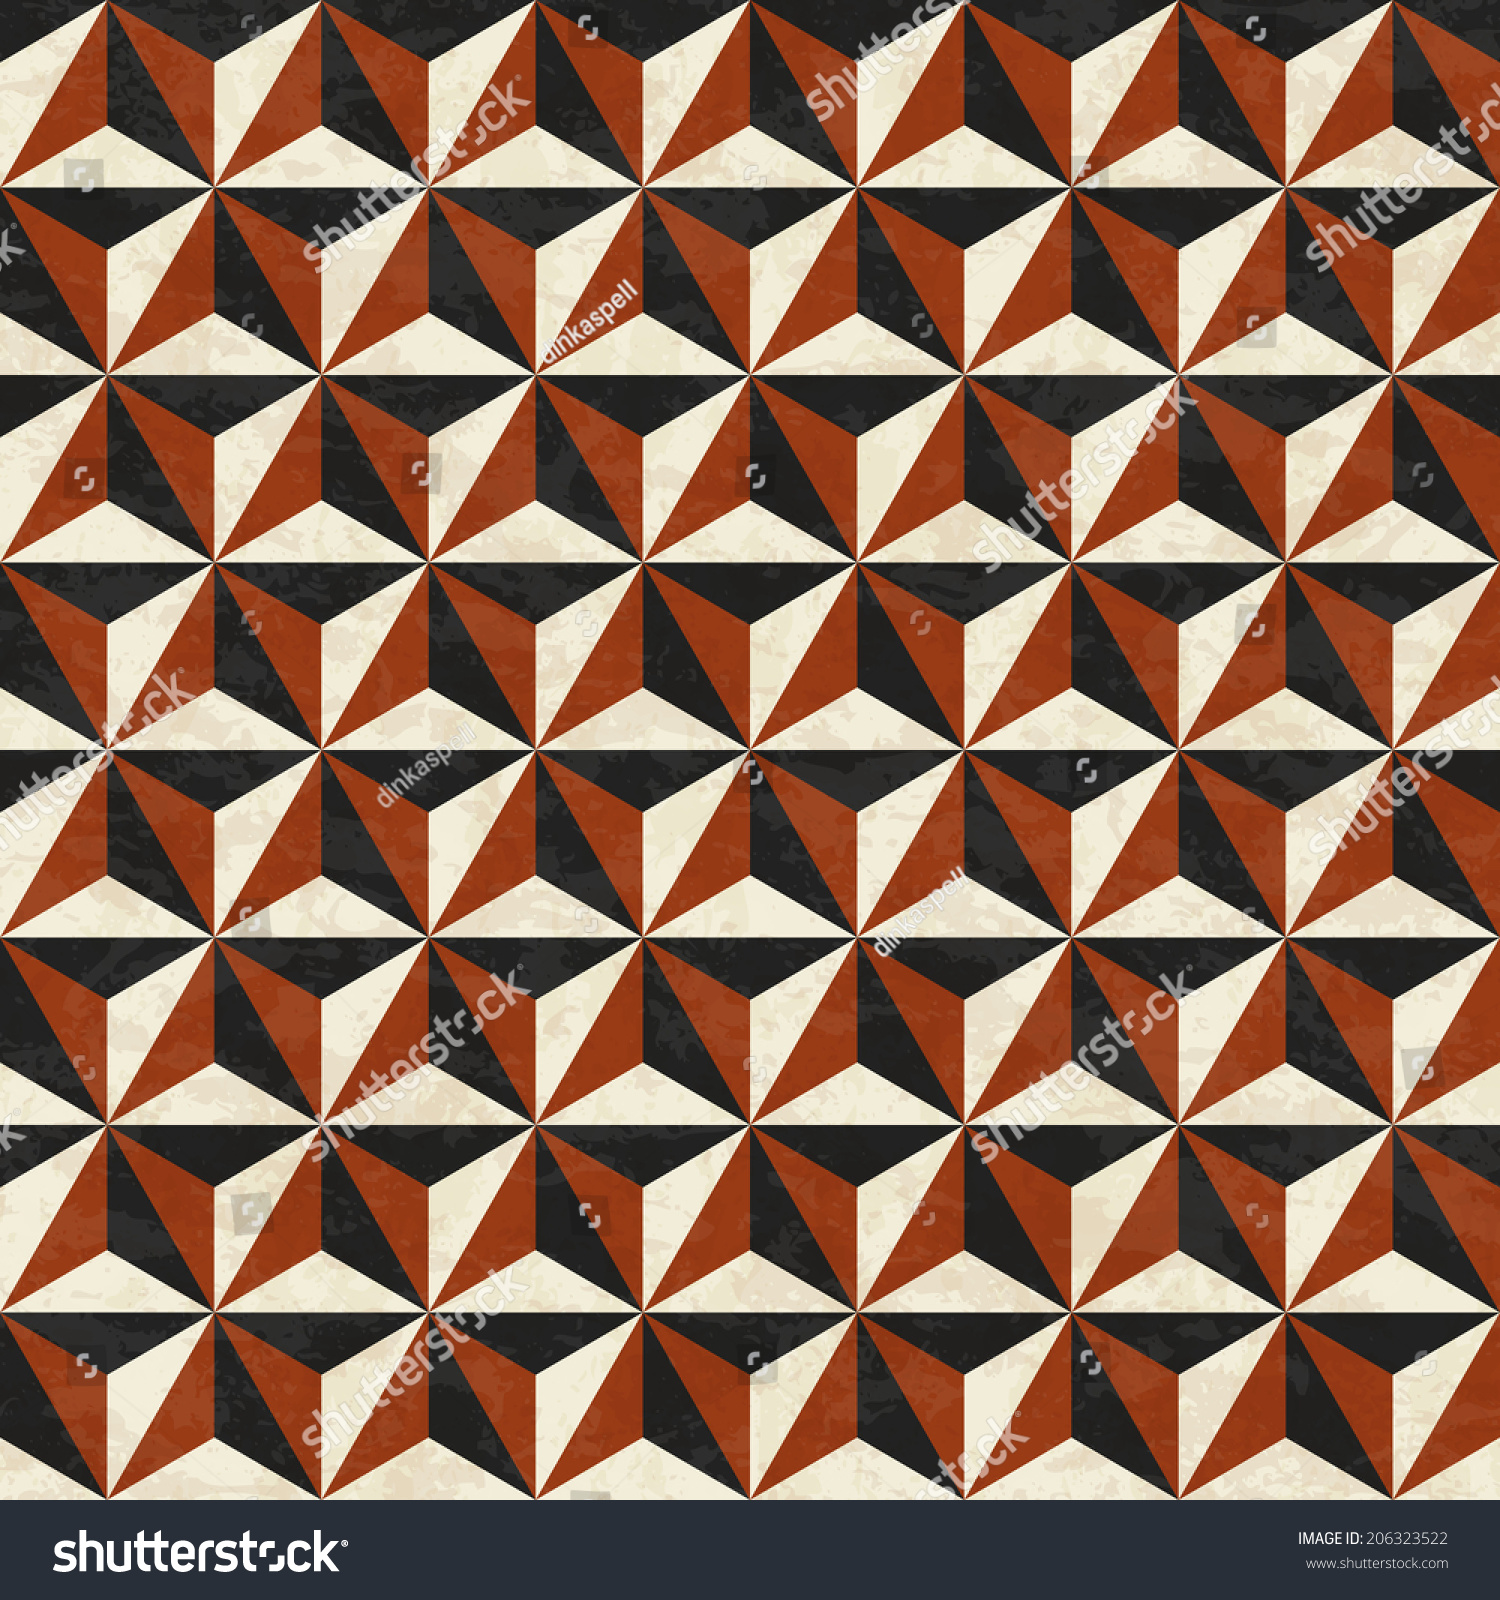 Escher floor tiles image collections tile flooring design ideas geometric floor tiles image collections home fixtures decoration escher floor tiles gallery tile flooring design ideas doublecrazyfo Image collections